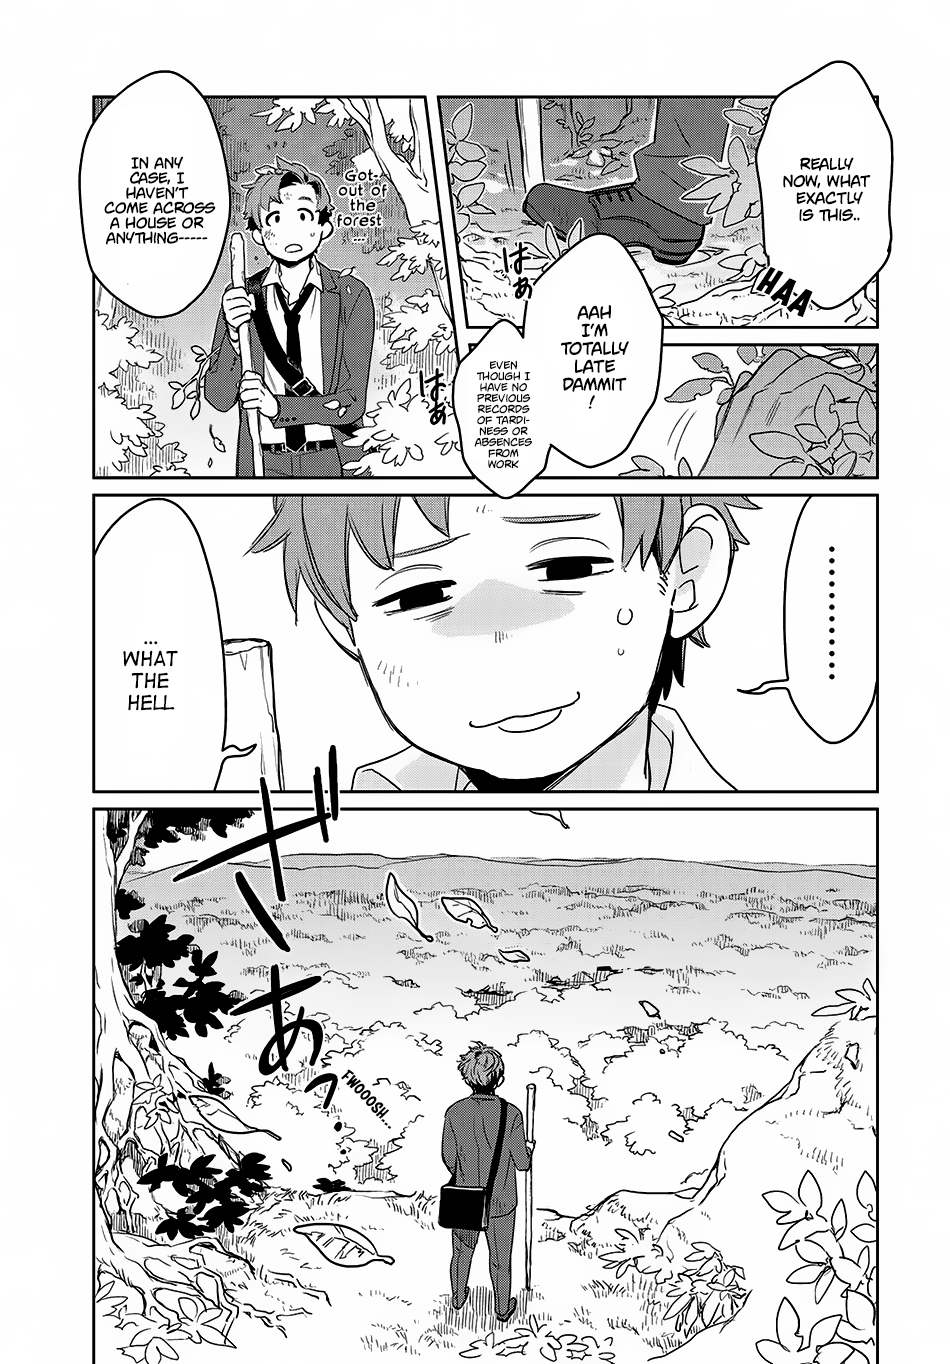 Isekai ni Kita Mitai dakedo Ikanisureba Yoi no Darou Chapter 1 page 12 - MangaSim.com